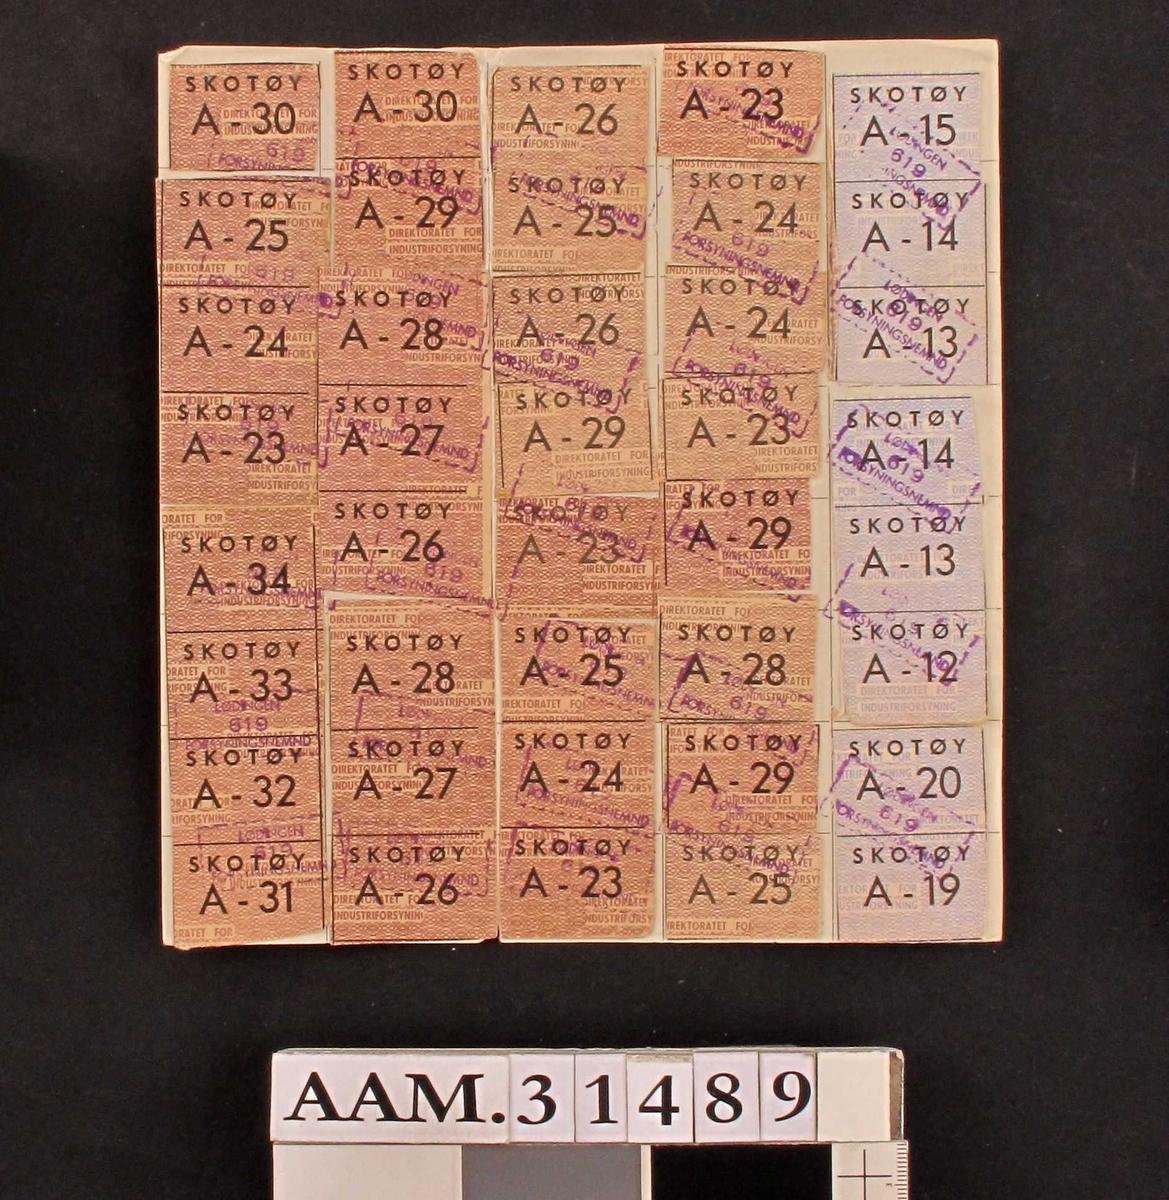 SKOTØY samt enten A, B eller C med et tall bak  Varierende farger